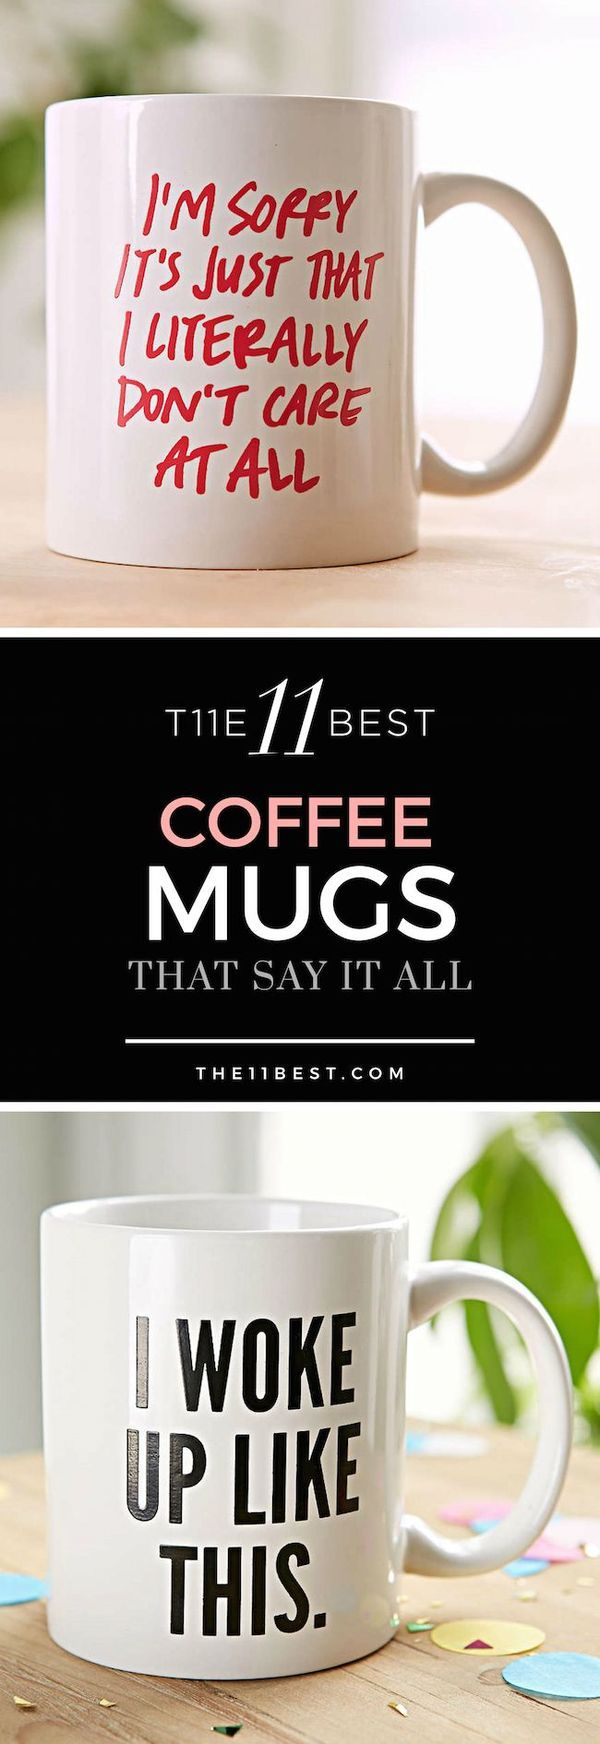 The 11 Best Coffee Mugs